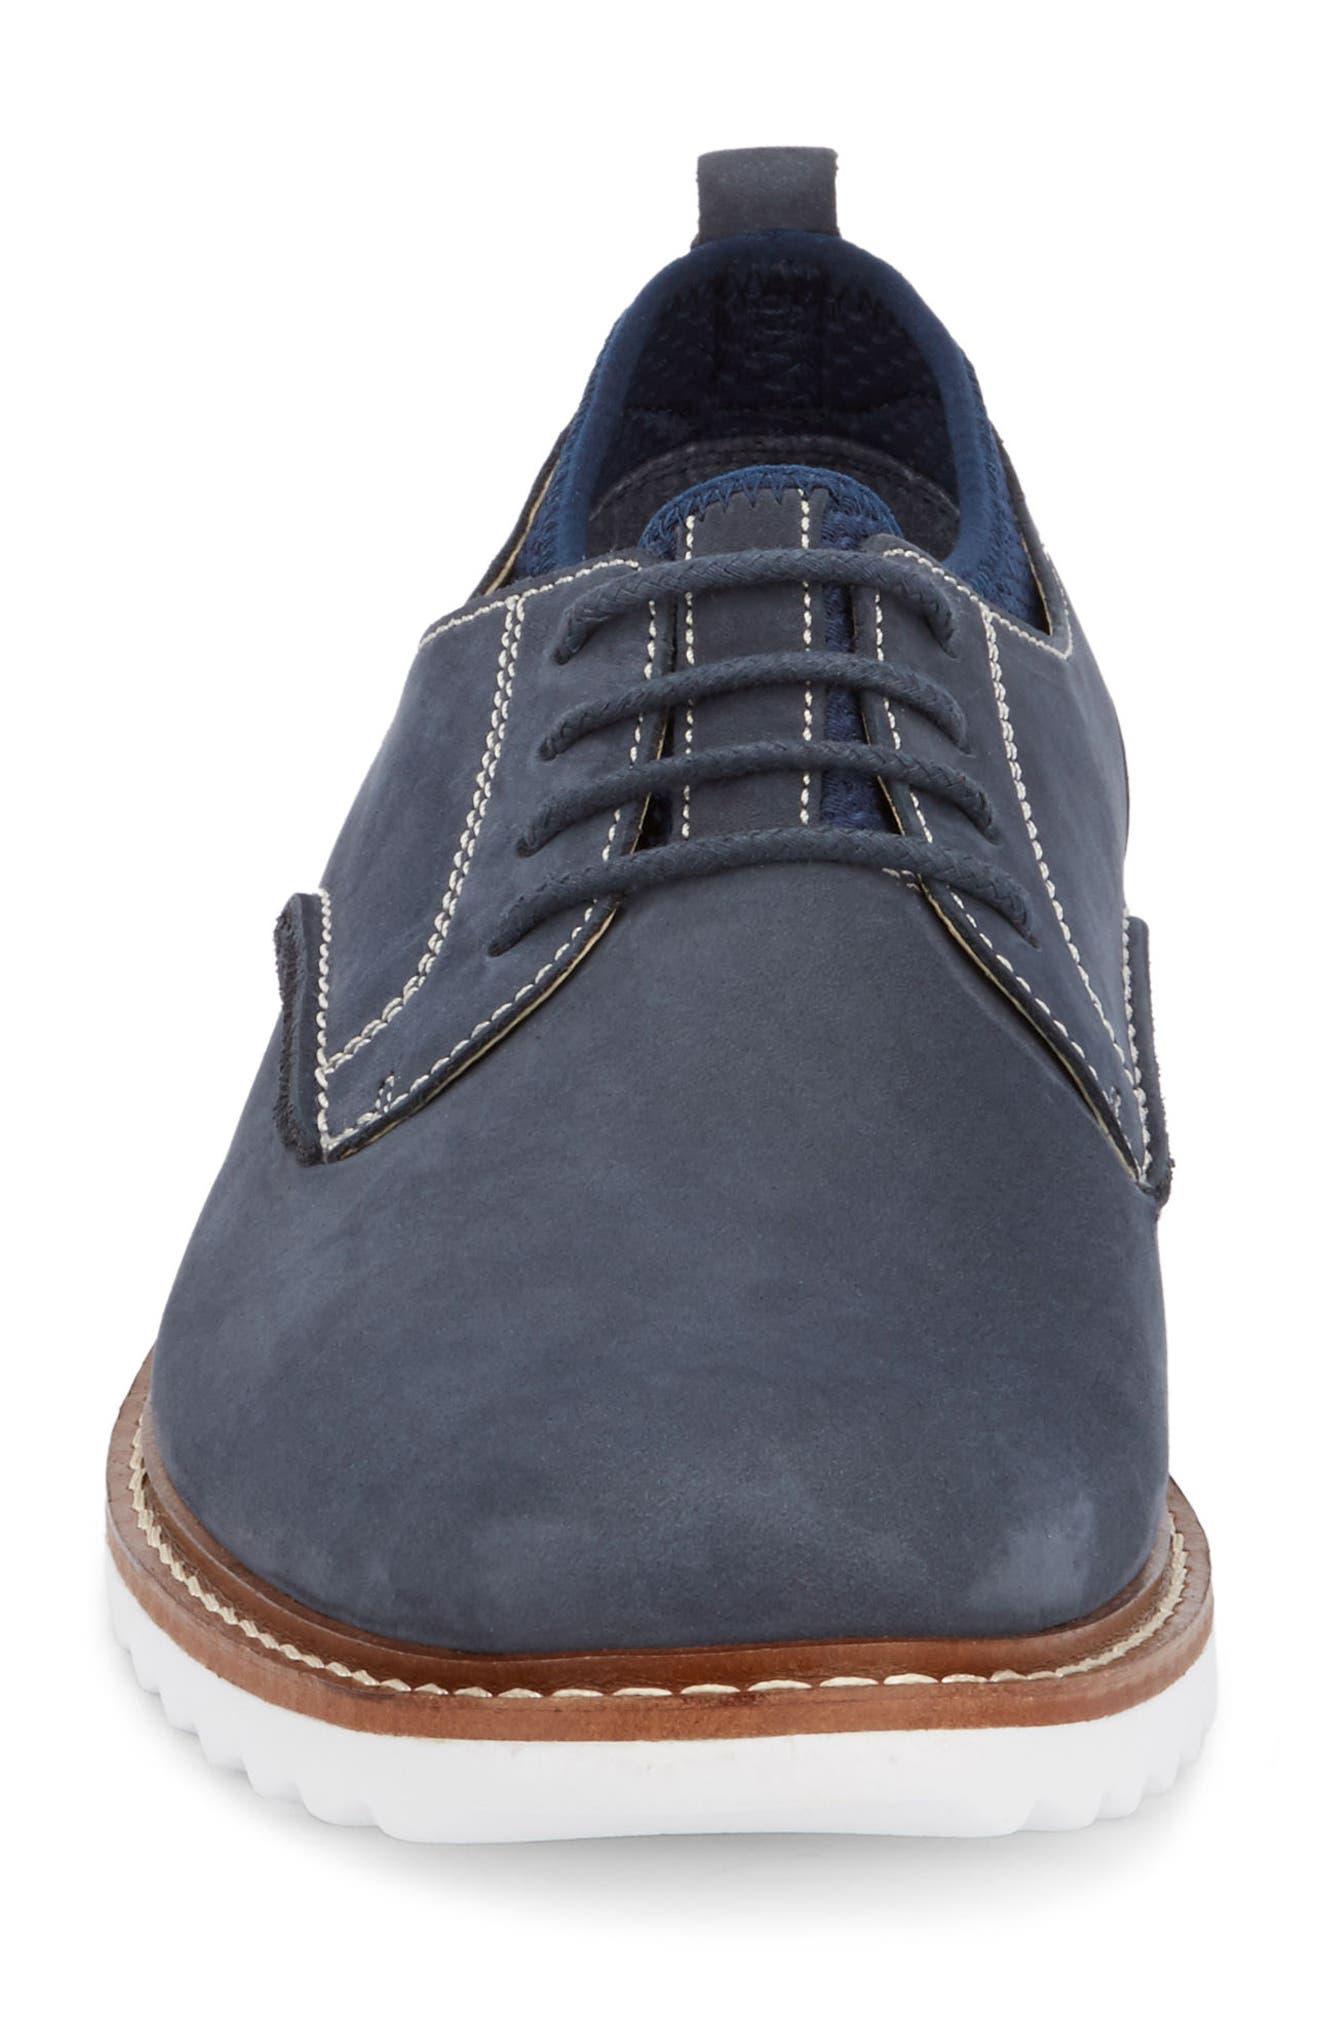 Buck 2.0 Plain Toe Derby,                             Alternate thumbnail 4, color,                             NAVY NUBUCK